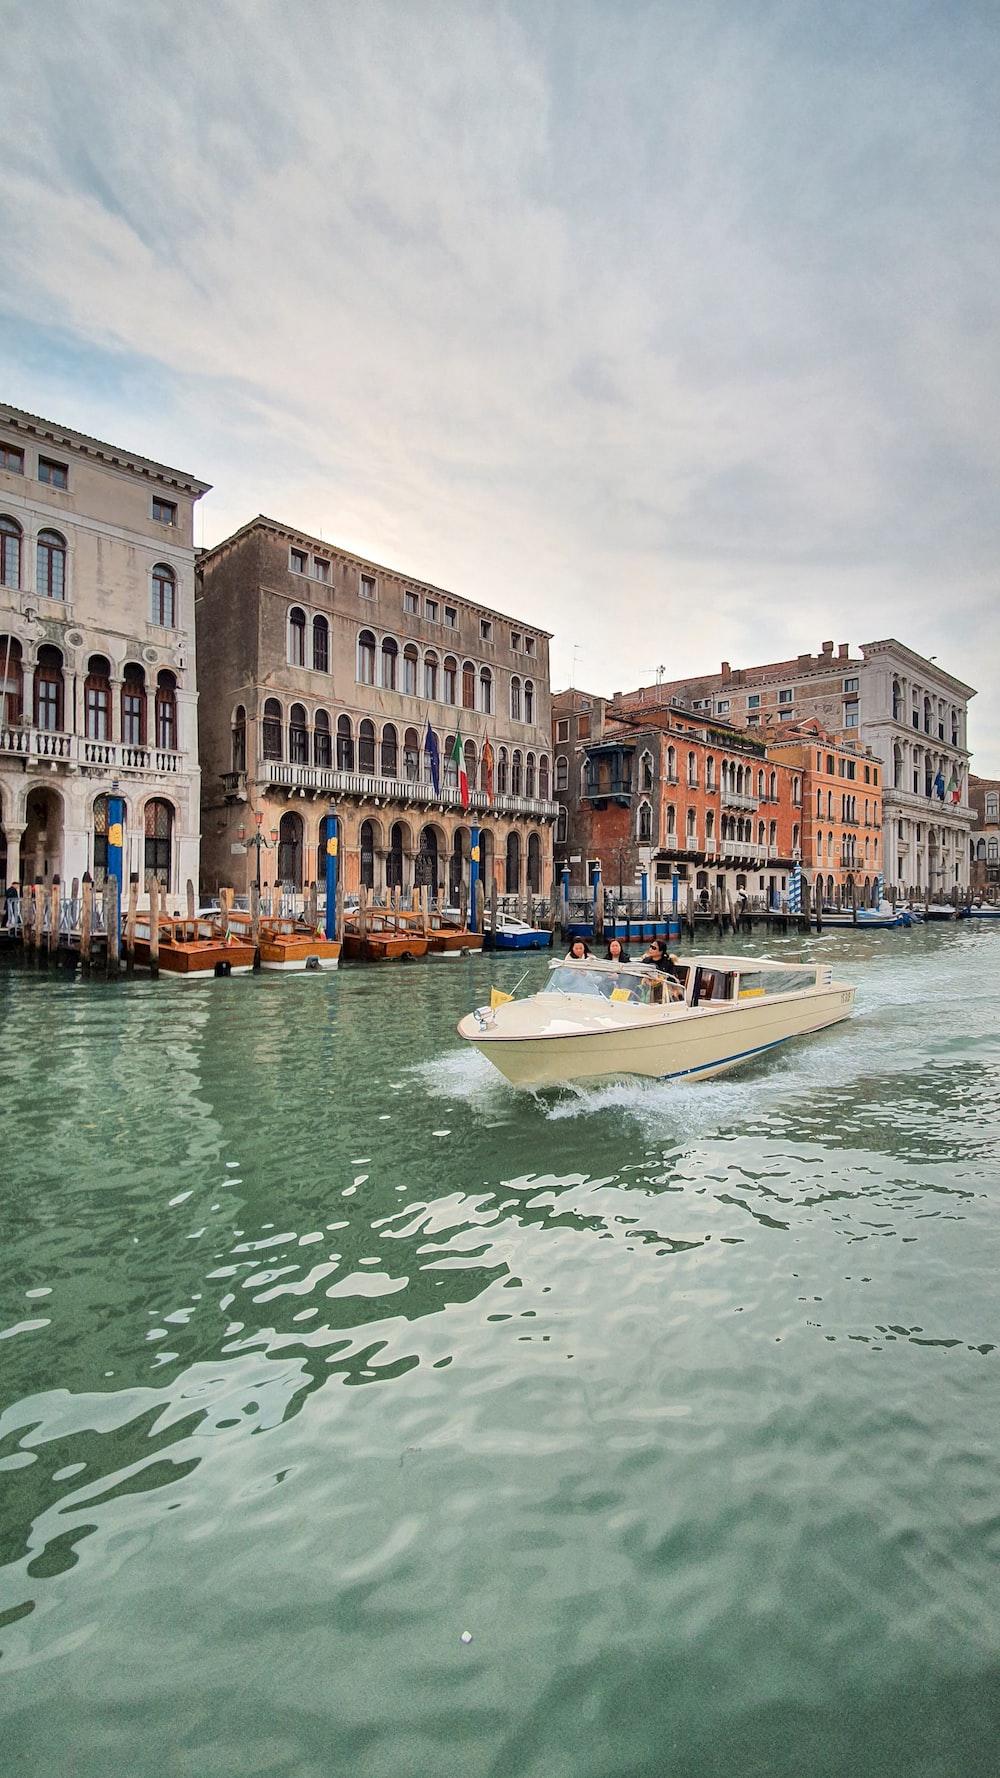 Grand Canal, Venice France